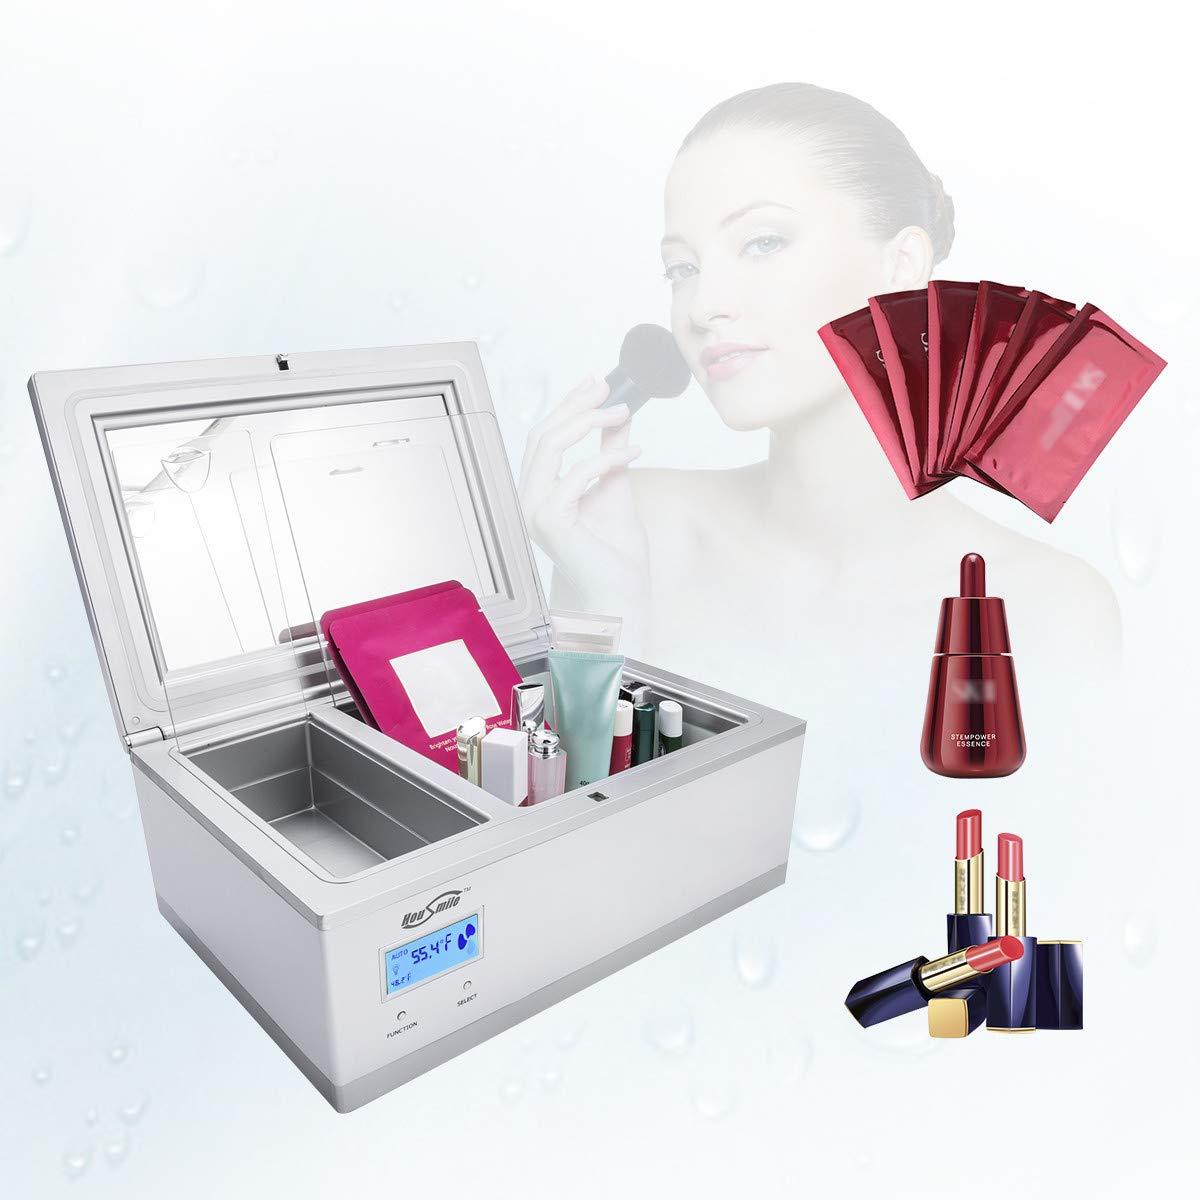 Mini Fridge, Housmile Electric Cooler Mini Refrigerator Thermoelectric Cosmetic Small Fridge for Eye Cream, Facial Mask, Eyeliner, Skin Cream, Organic Cosmetics, 0.1 Cubic Feet(3 Liter)